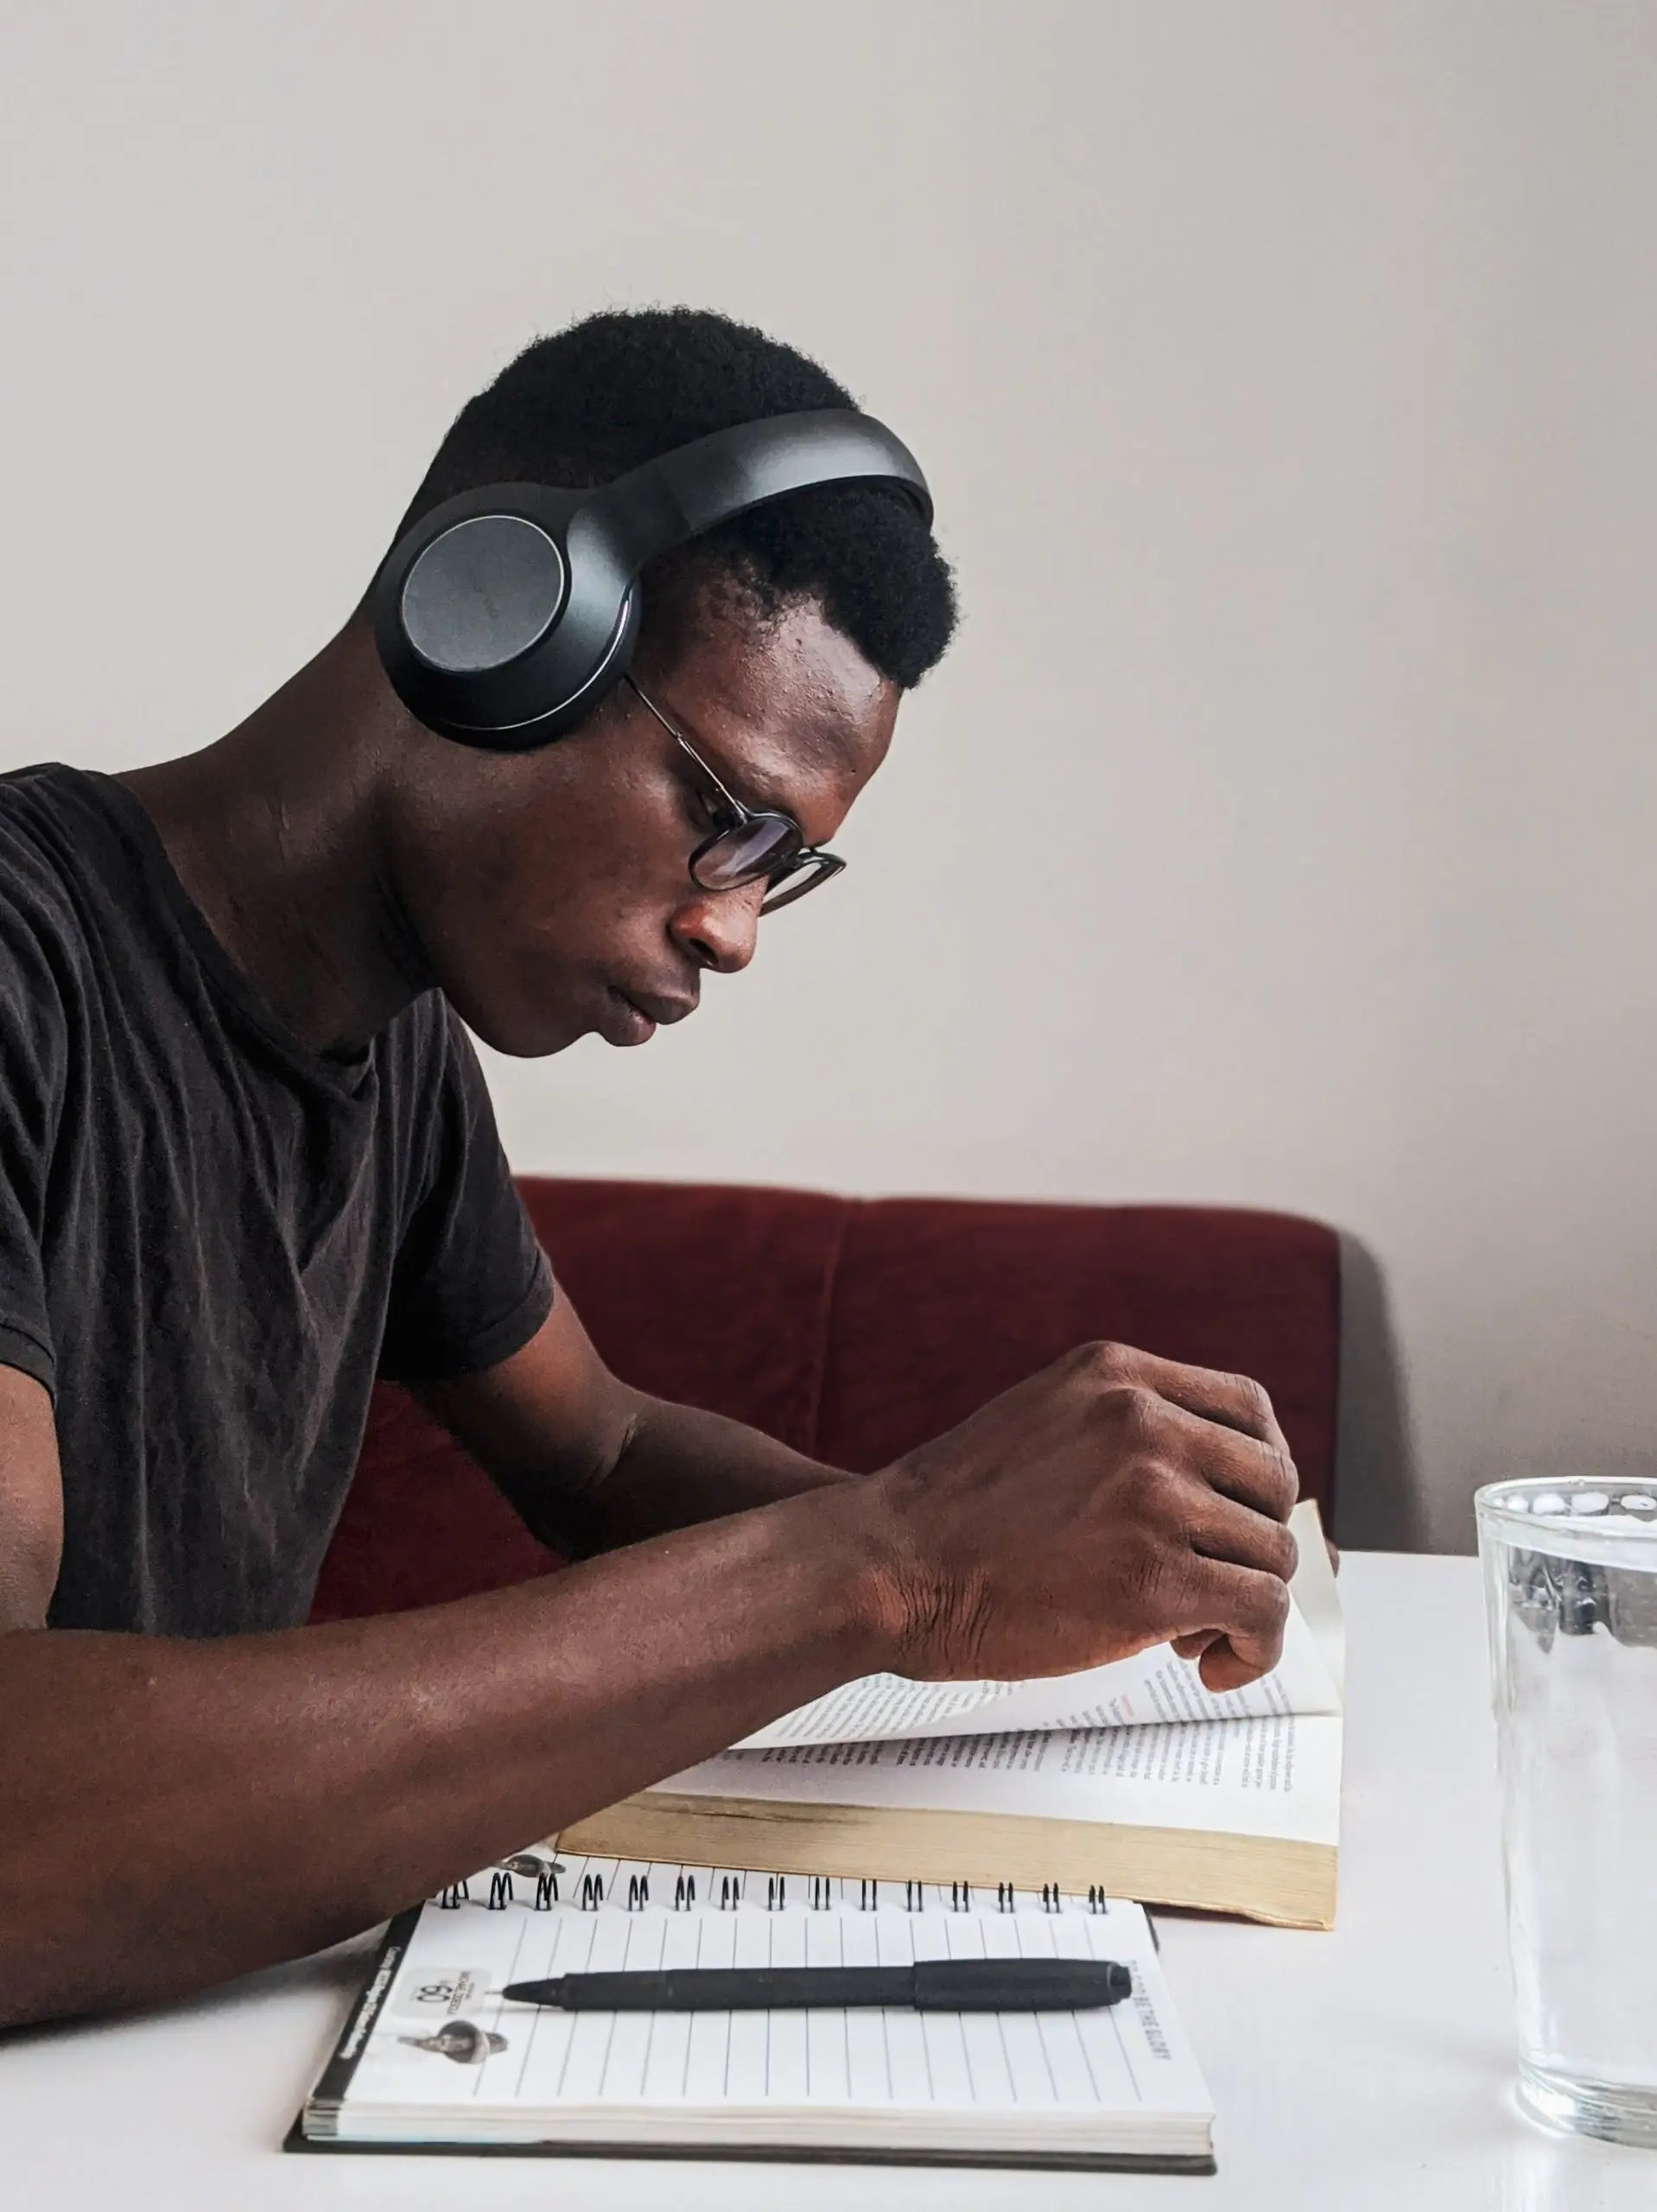 Man Wearing Black Crew-neck T-shirt Using Black Headphones Reading Book While Sitting